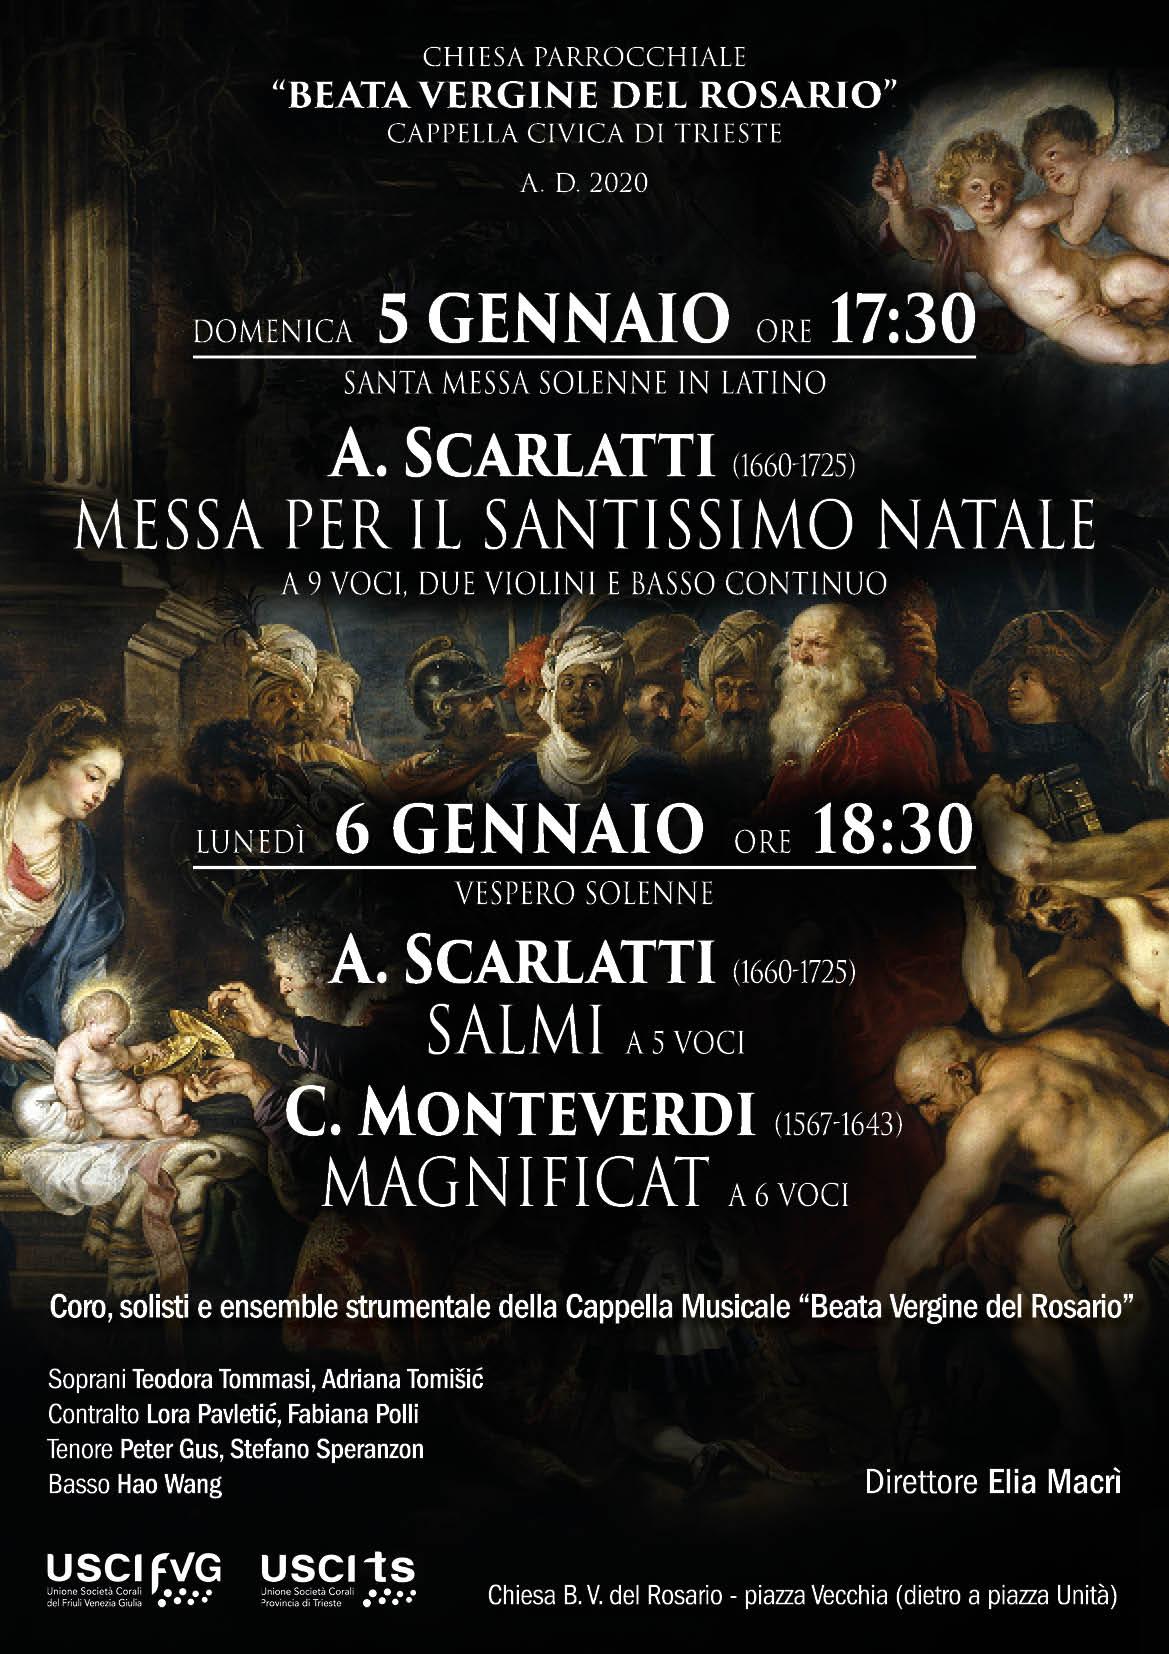 06.01.2020_Salmi, A. Scarlatti_Magnificat, C. Monteverdi